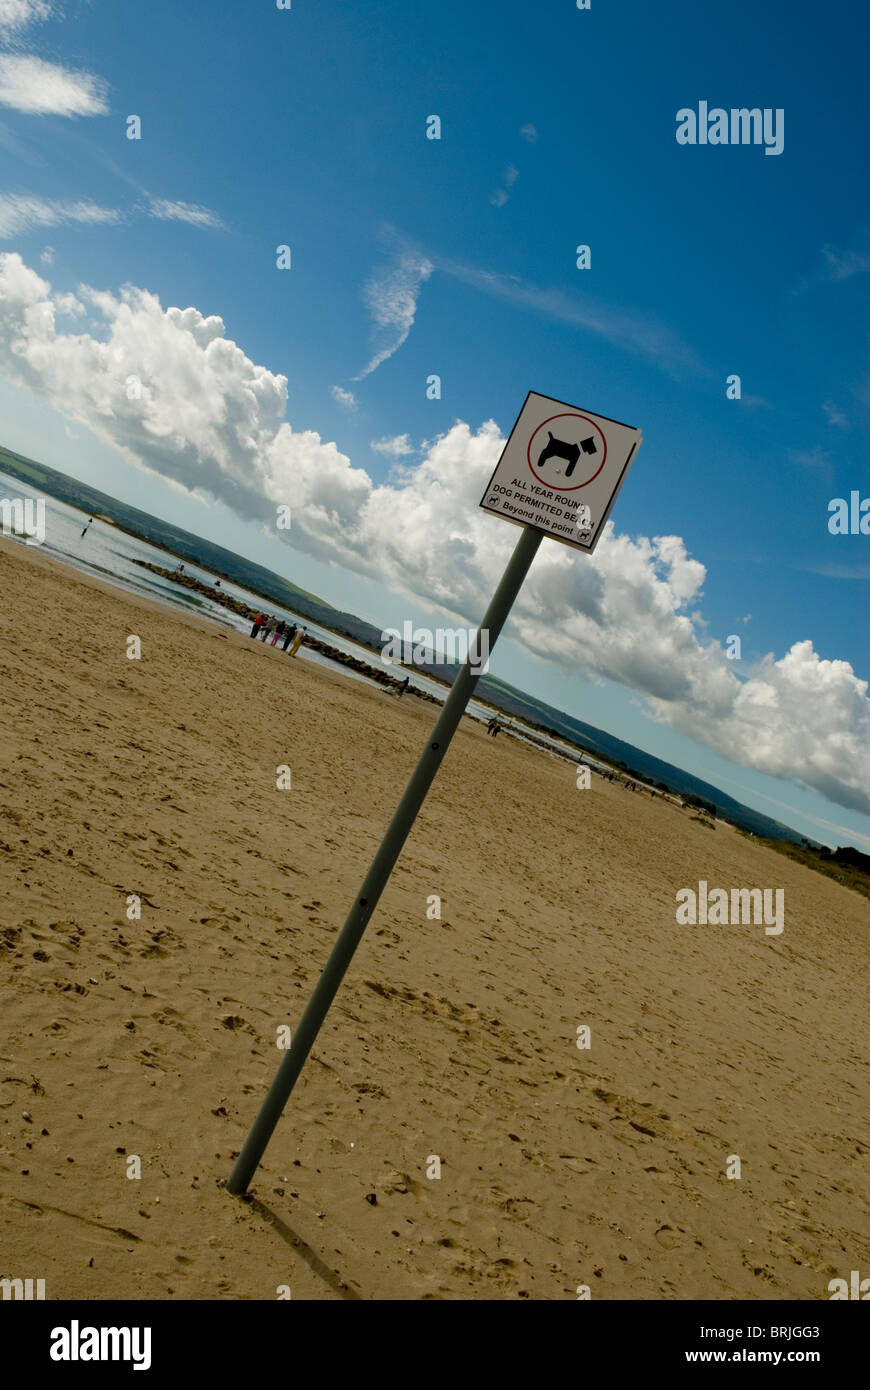 Dog restriction sign - Stock Image